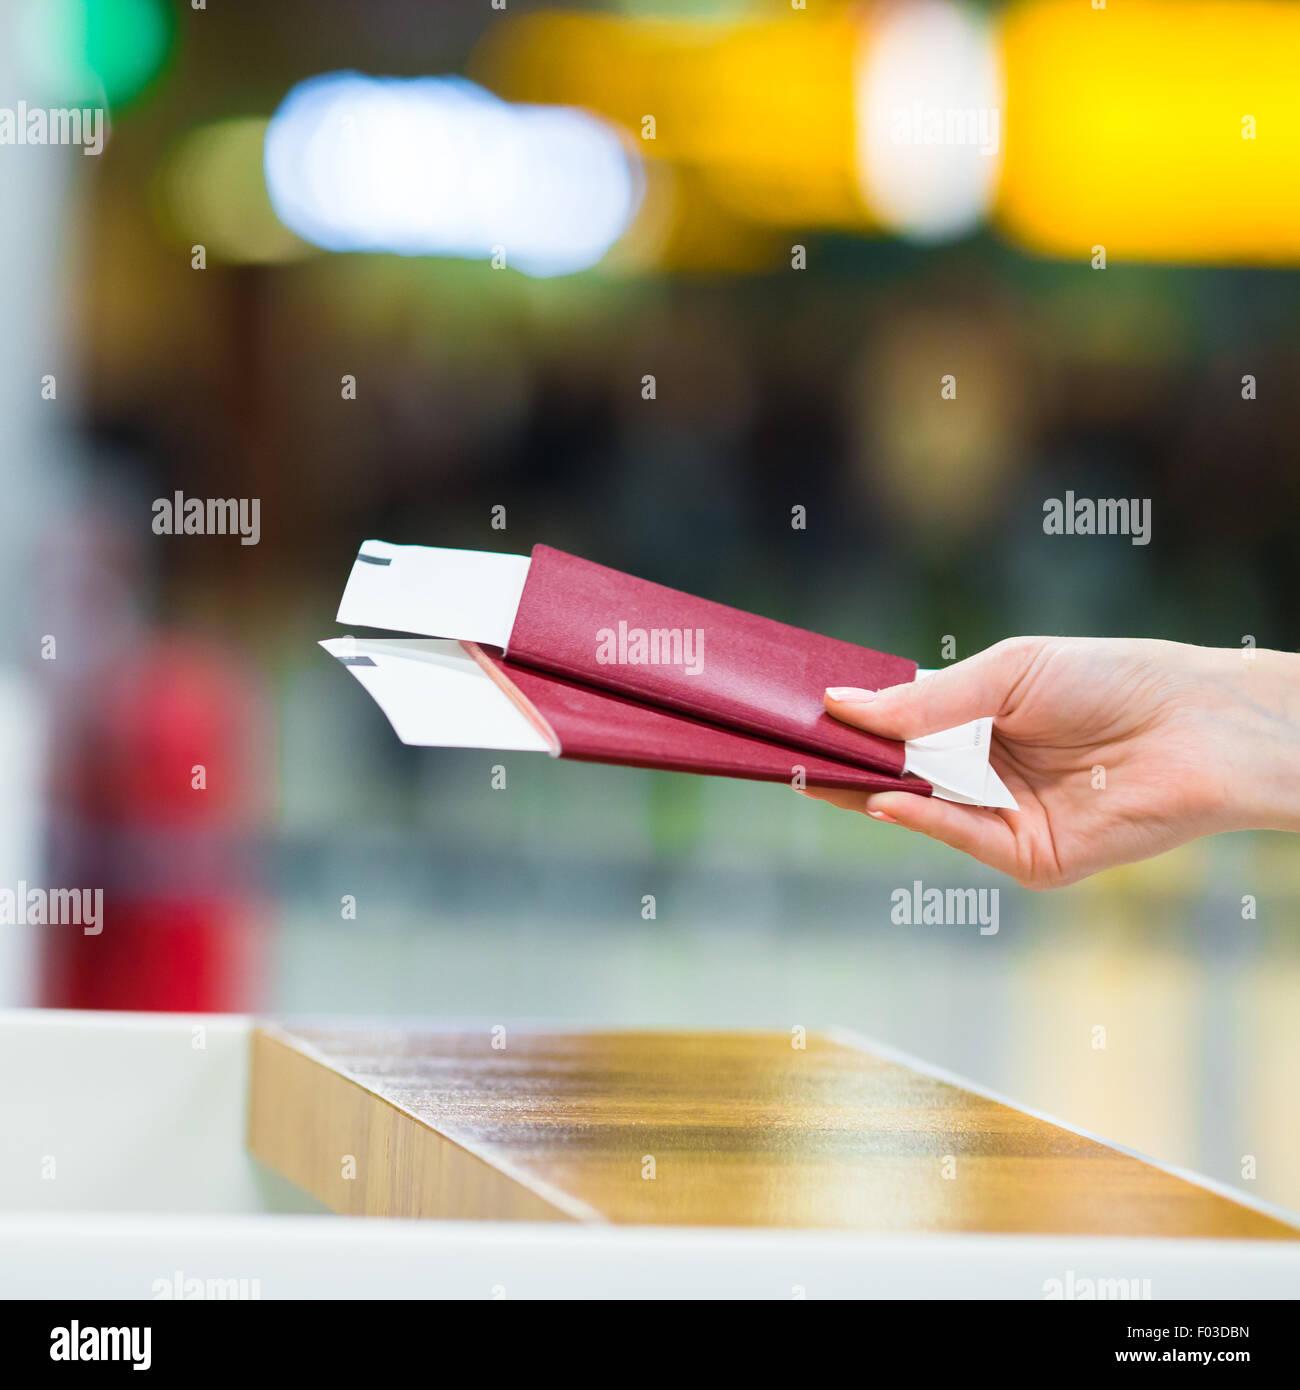 Closeup passports and boarding pass at airport indoor - Stock Image